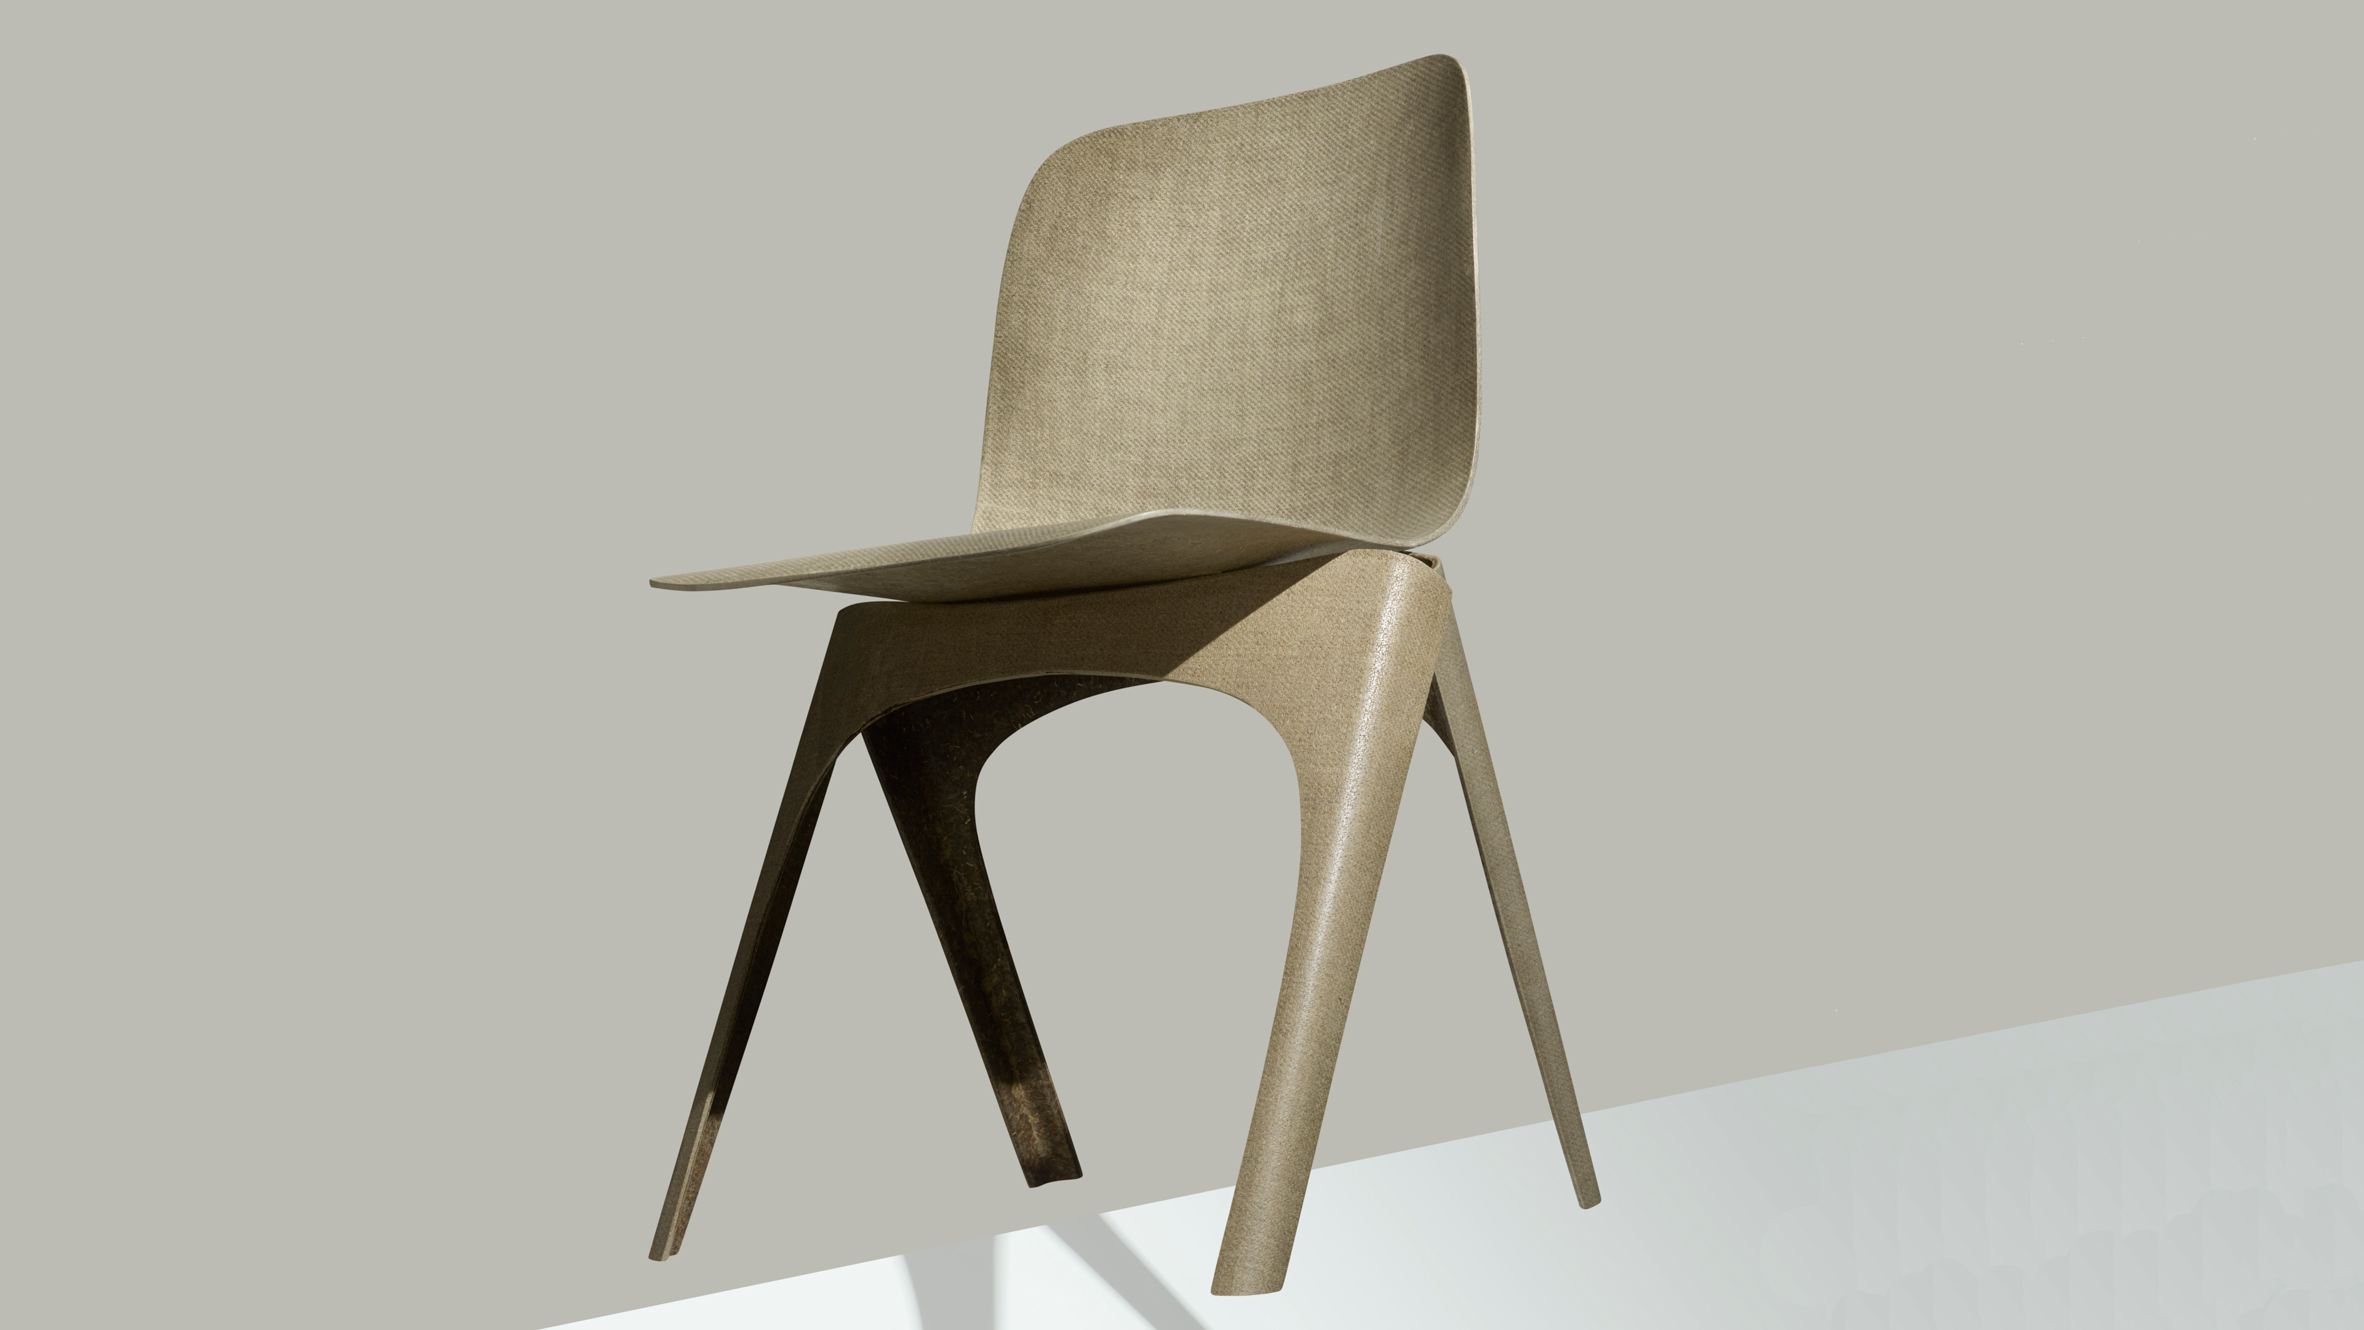 DDW: Flax chair - Christien Meindertsma